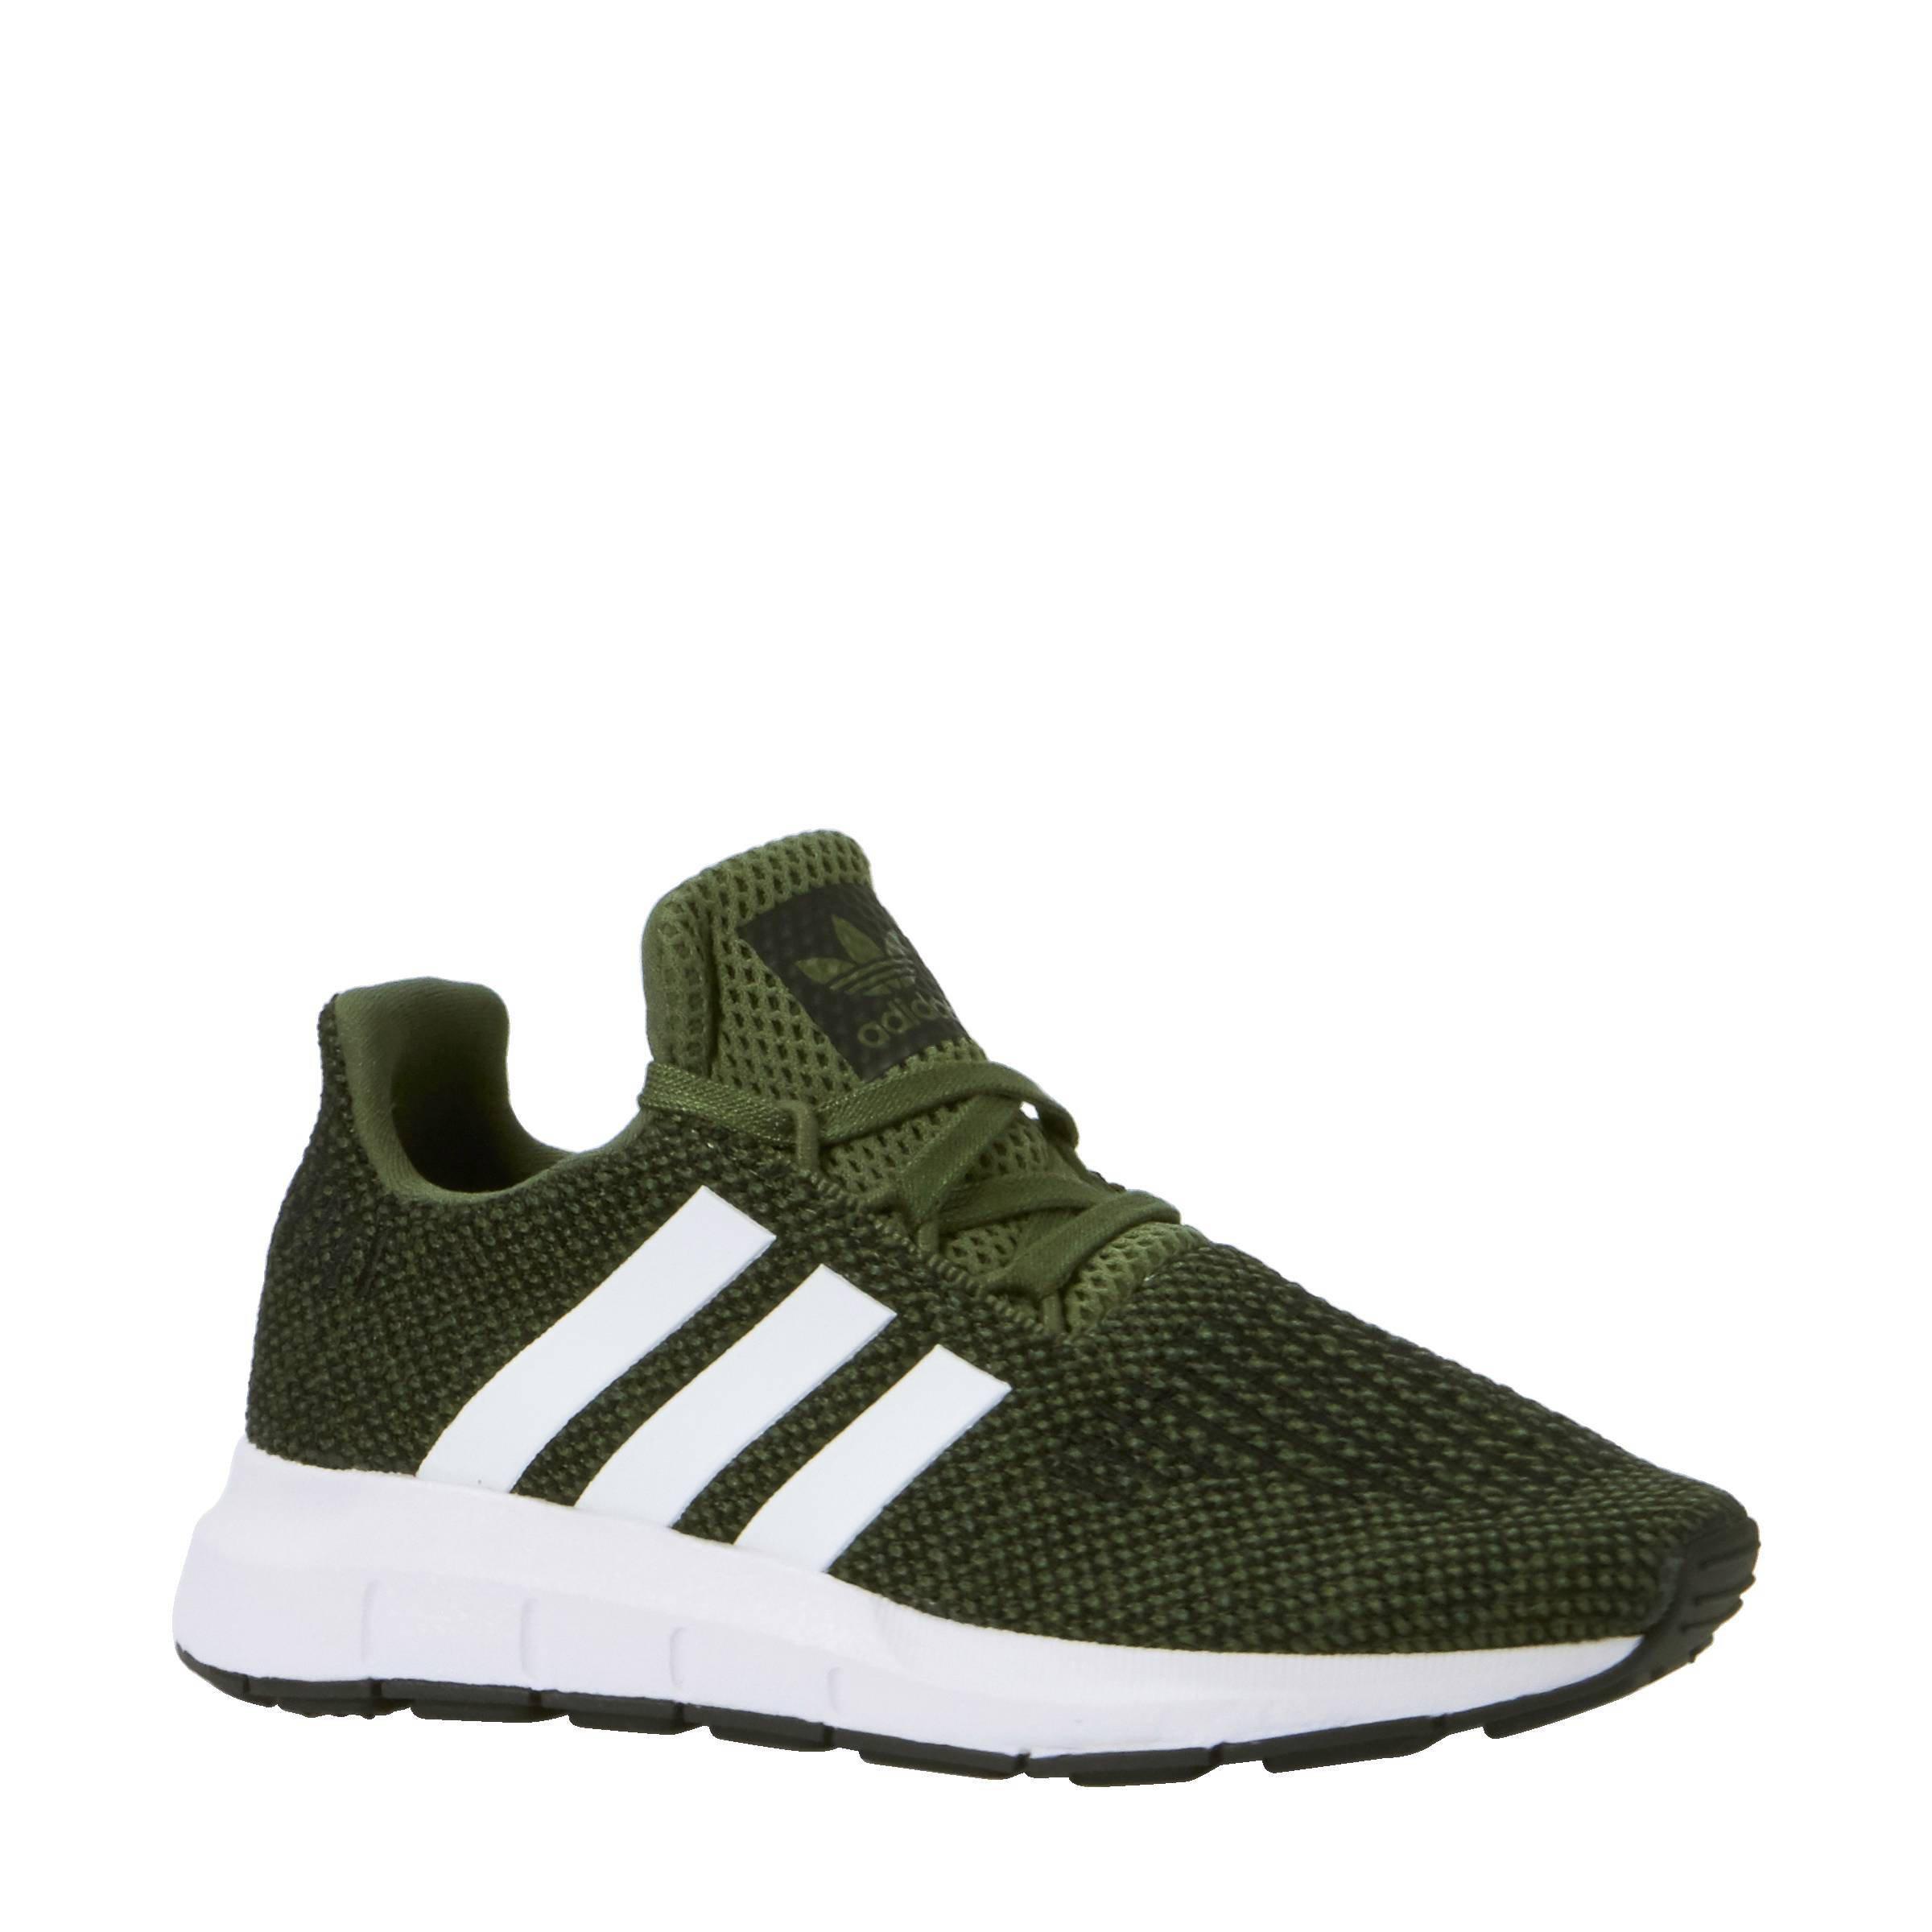 adidas Originals Swift Run C sneakers